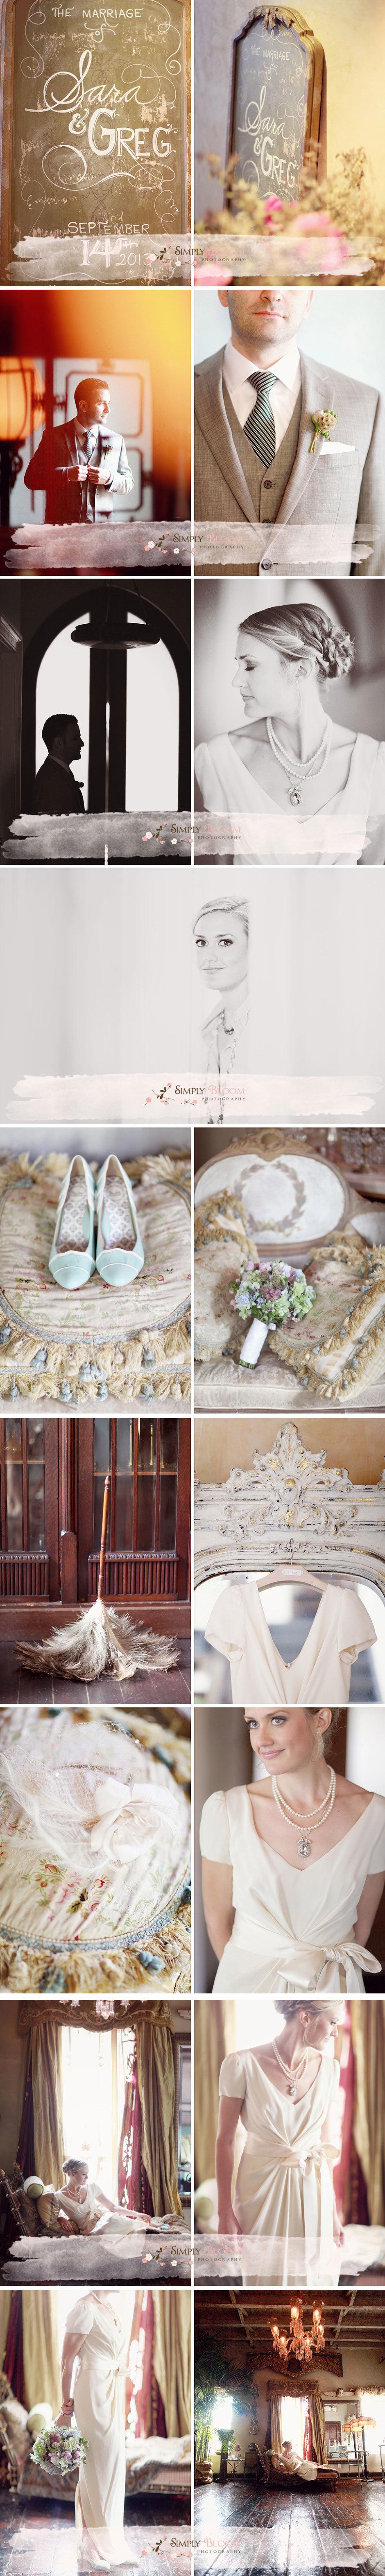 свадьба в винтажном стиле фото